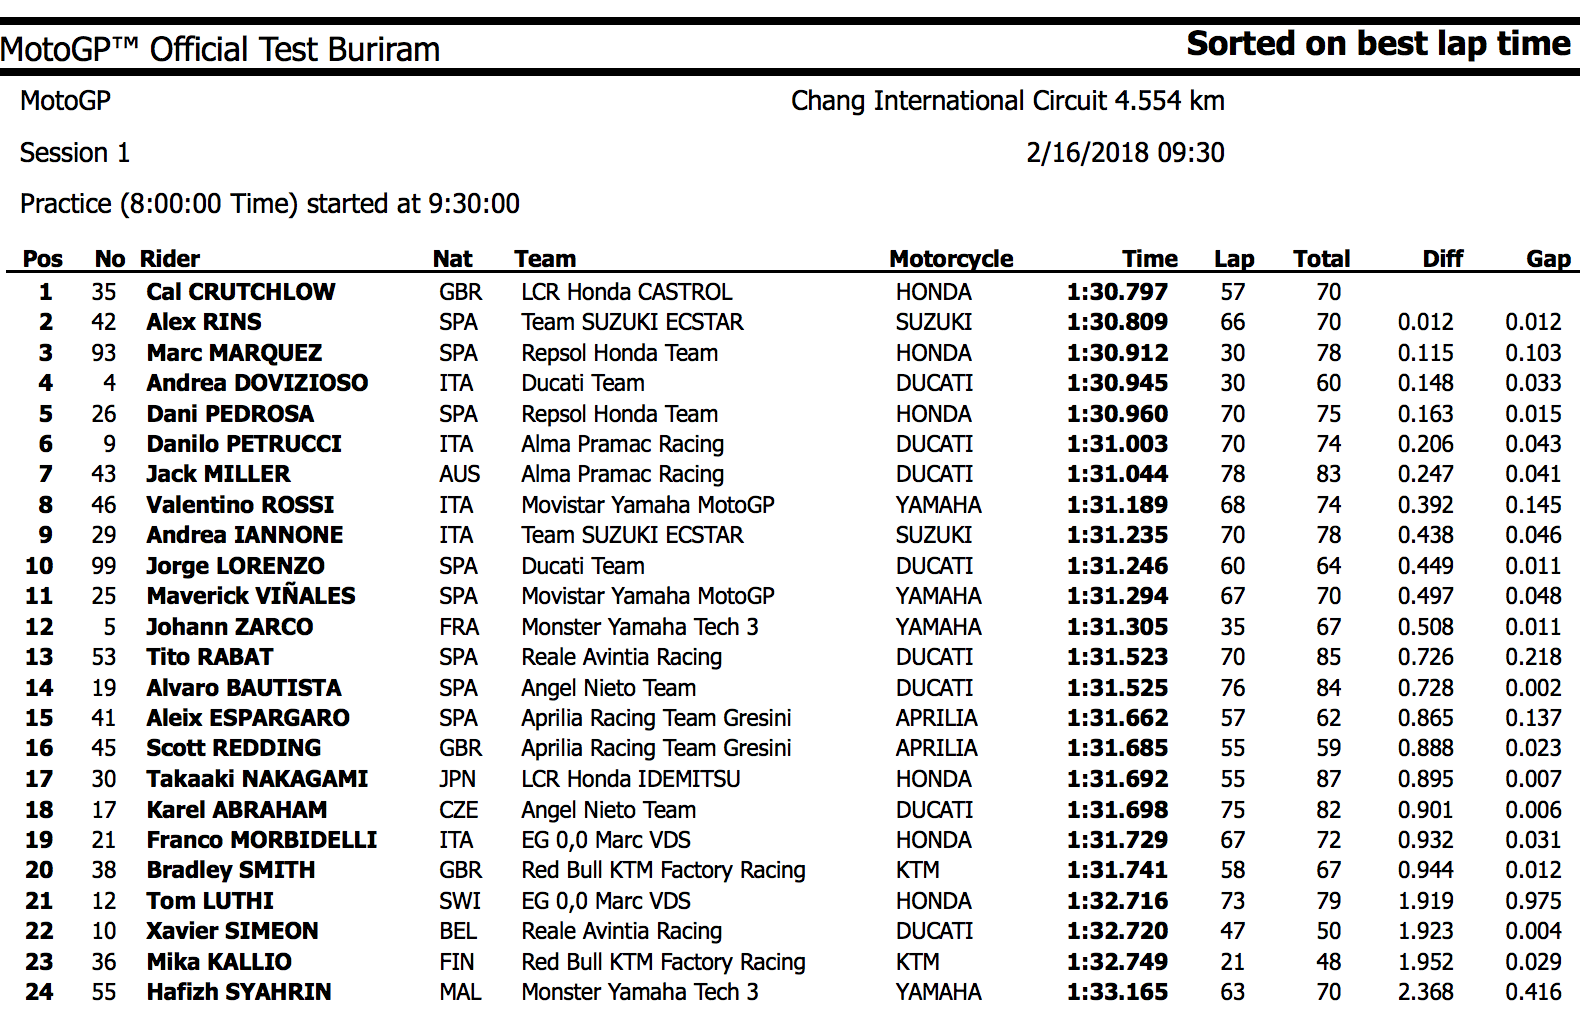 ★MotoGP2018 タイテスト初日トップはクラッチロー